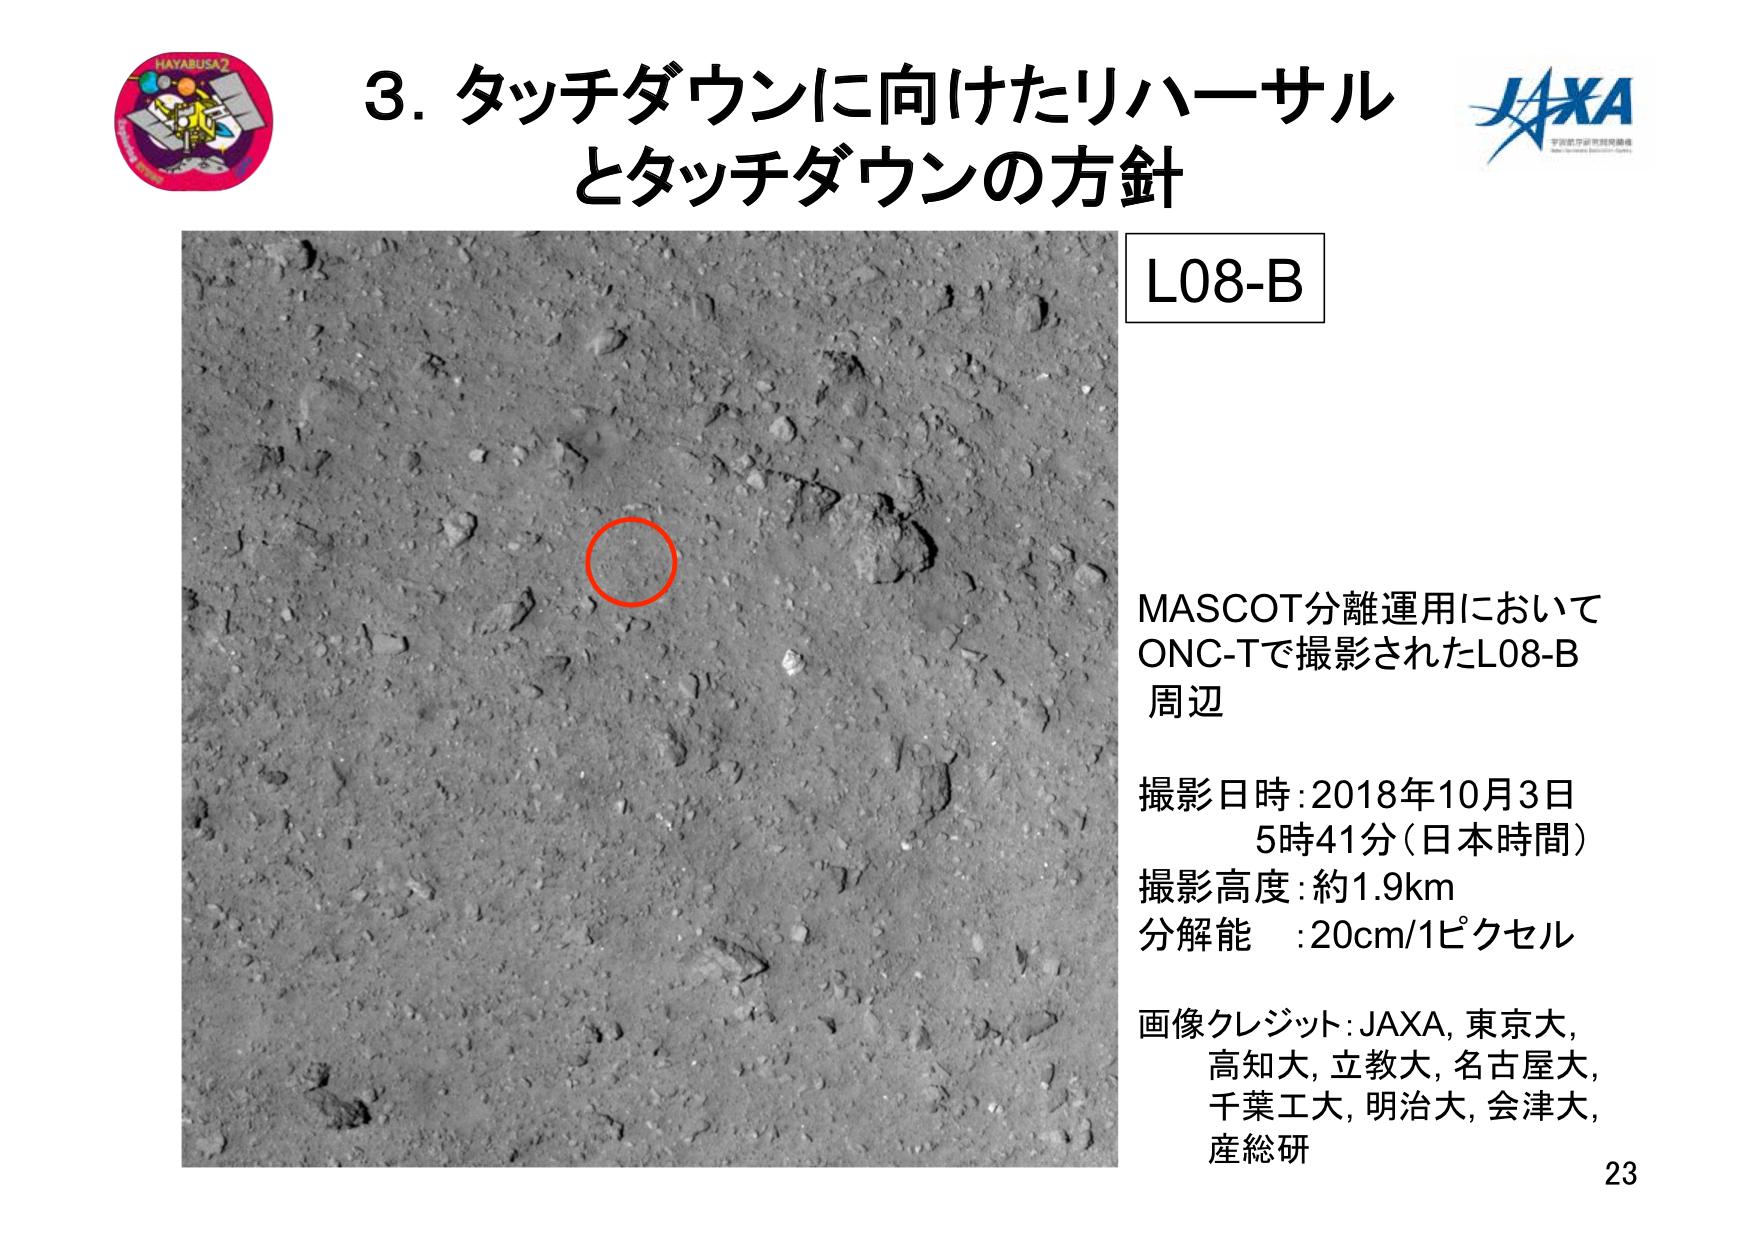 f:id:Imamura:20181011154002p:plain